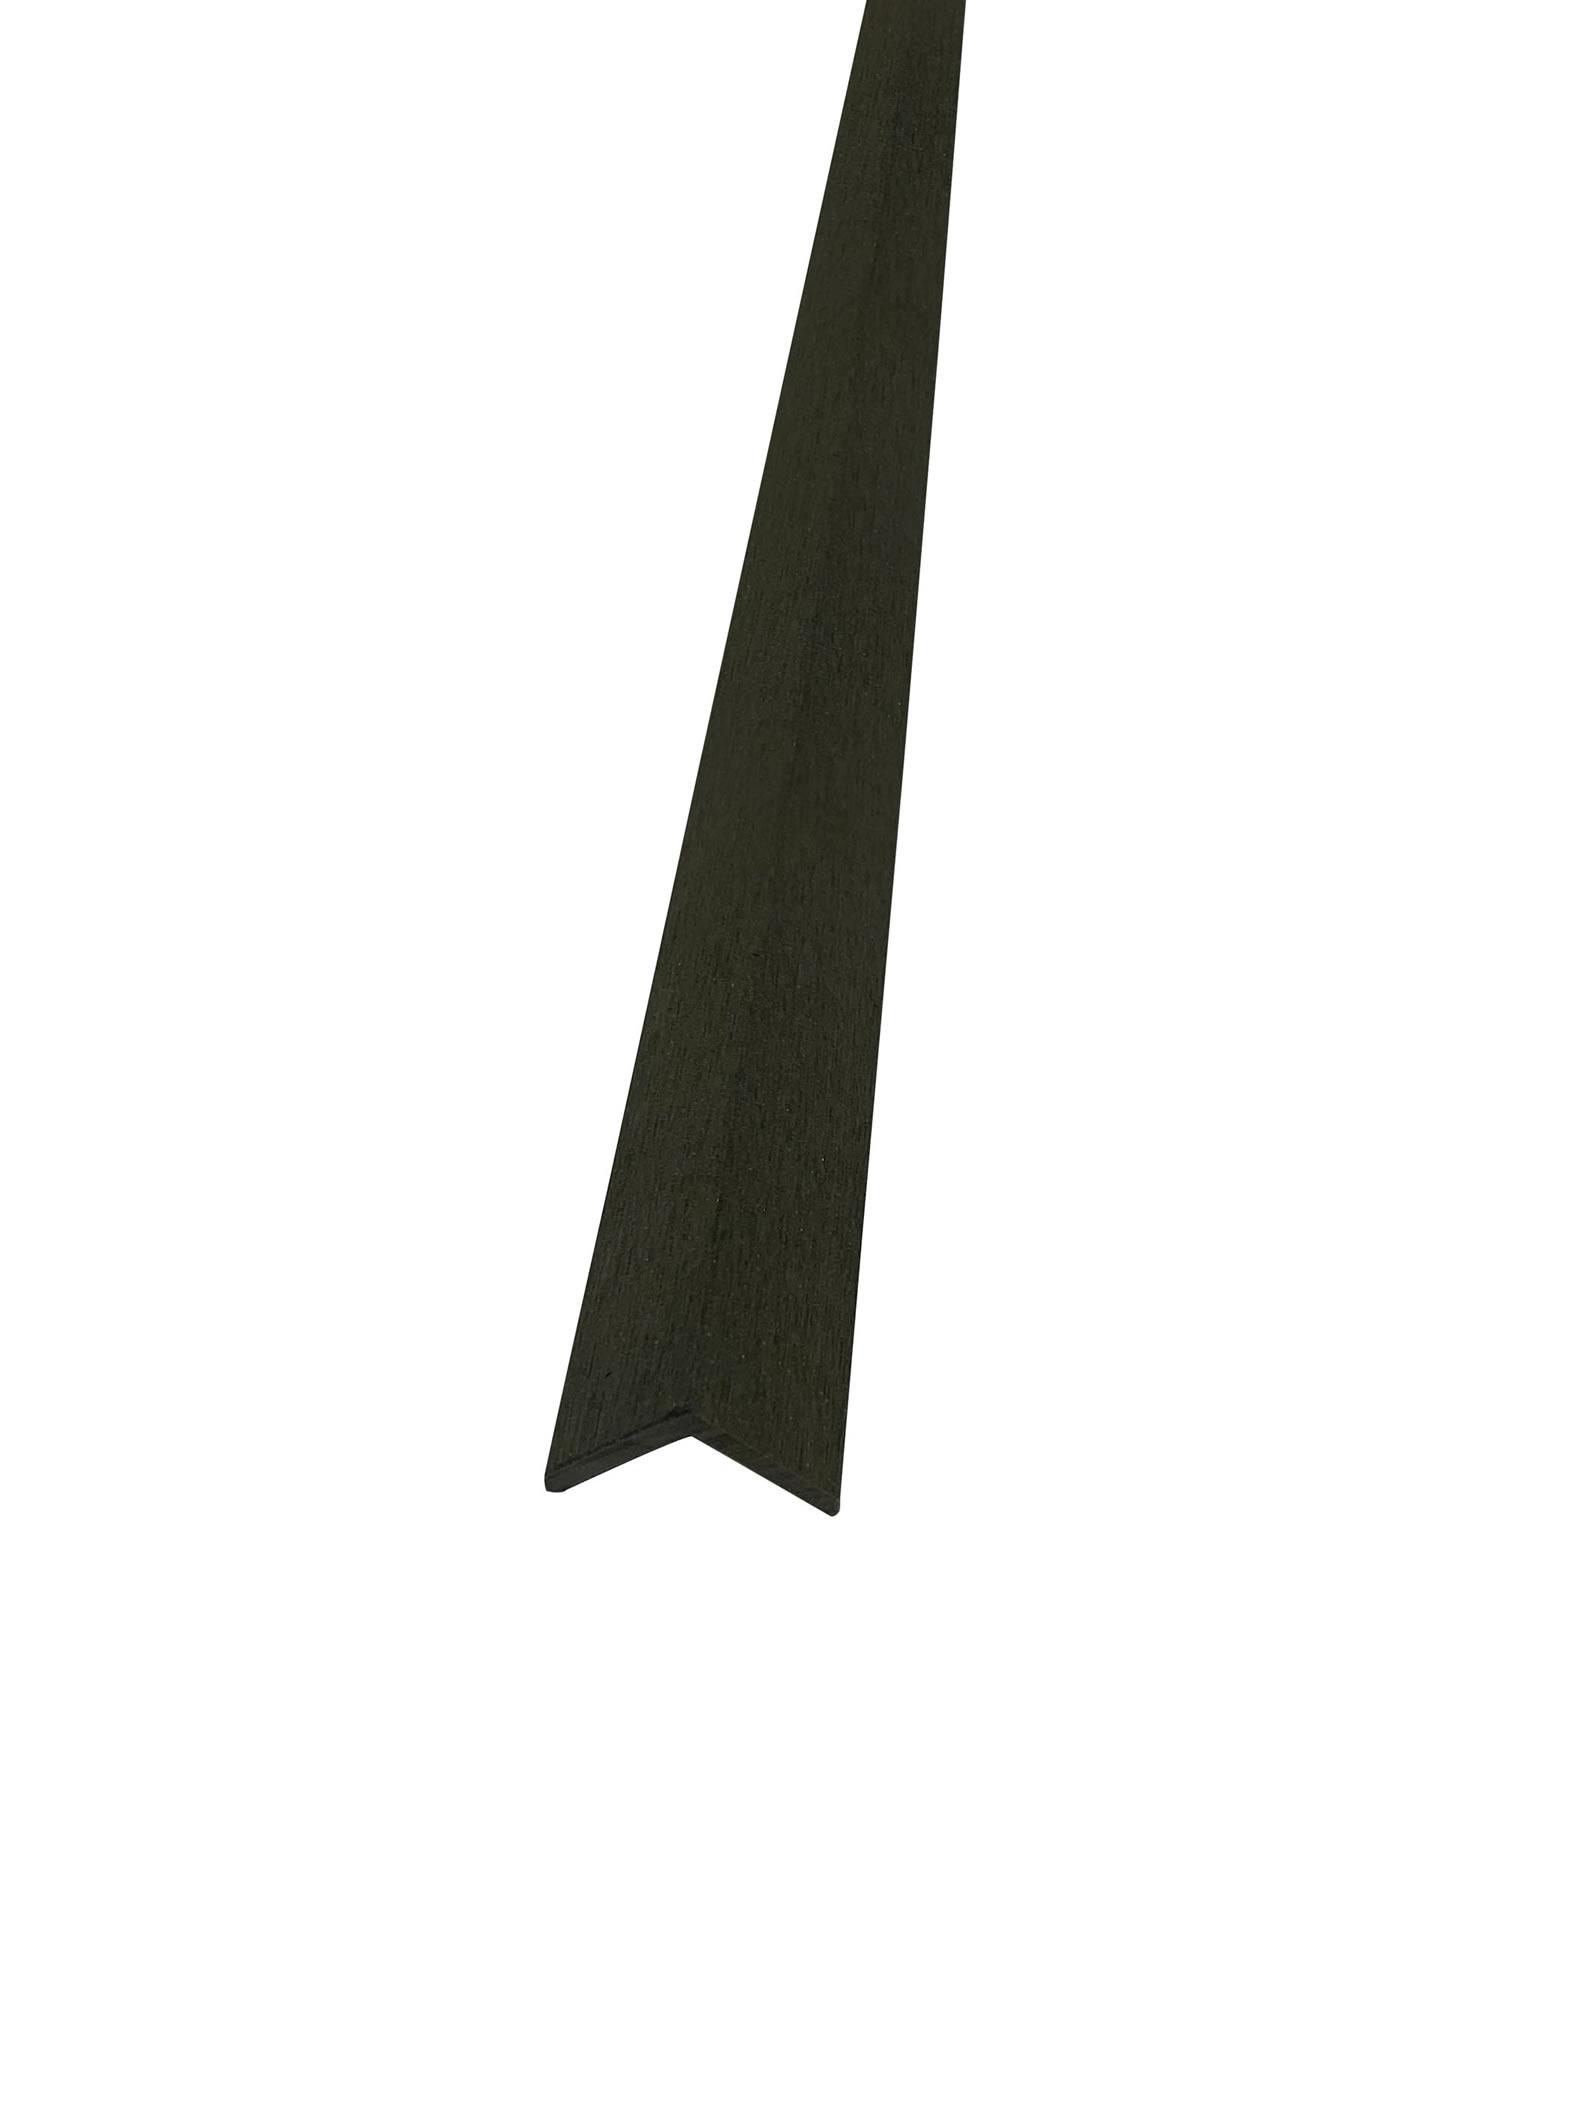 Black Decking Angle